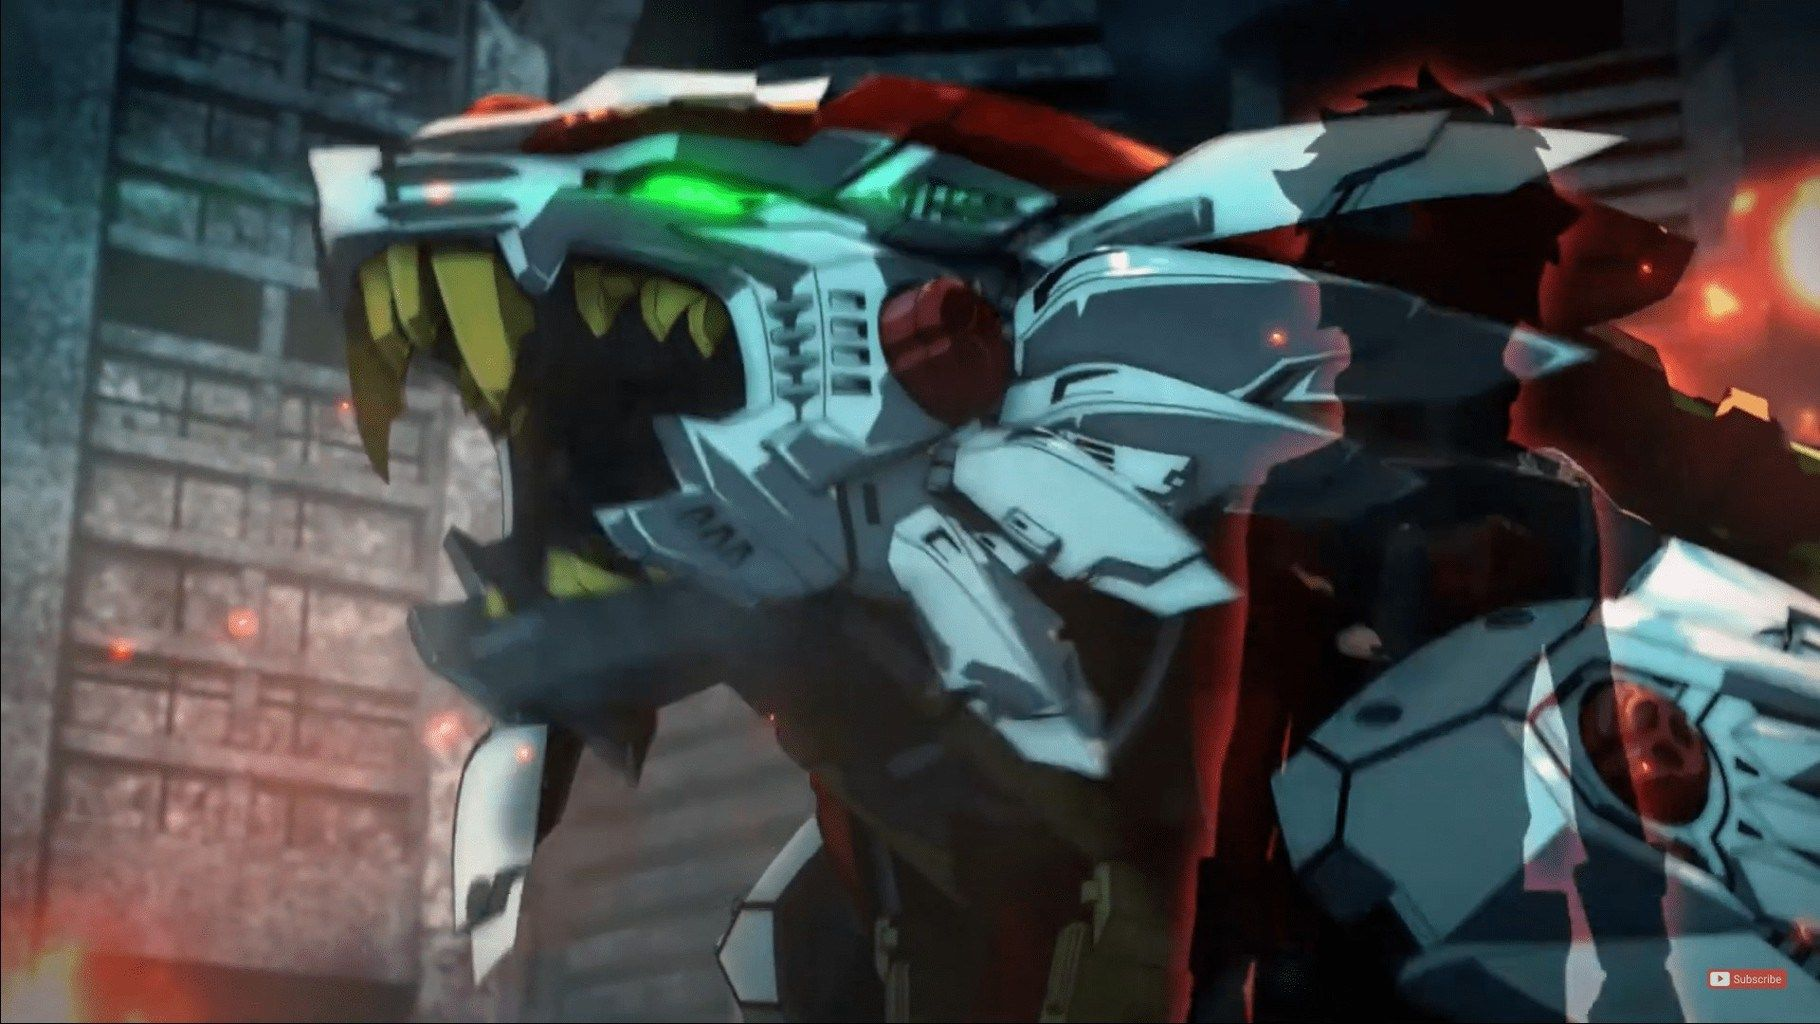 Zoids Wild ZERO anime season 2 promo video released. in